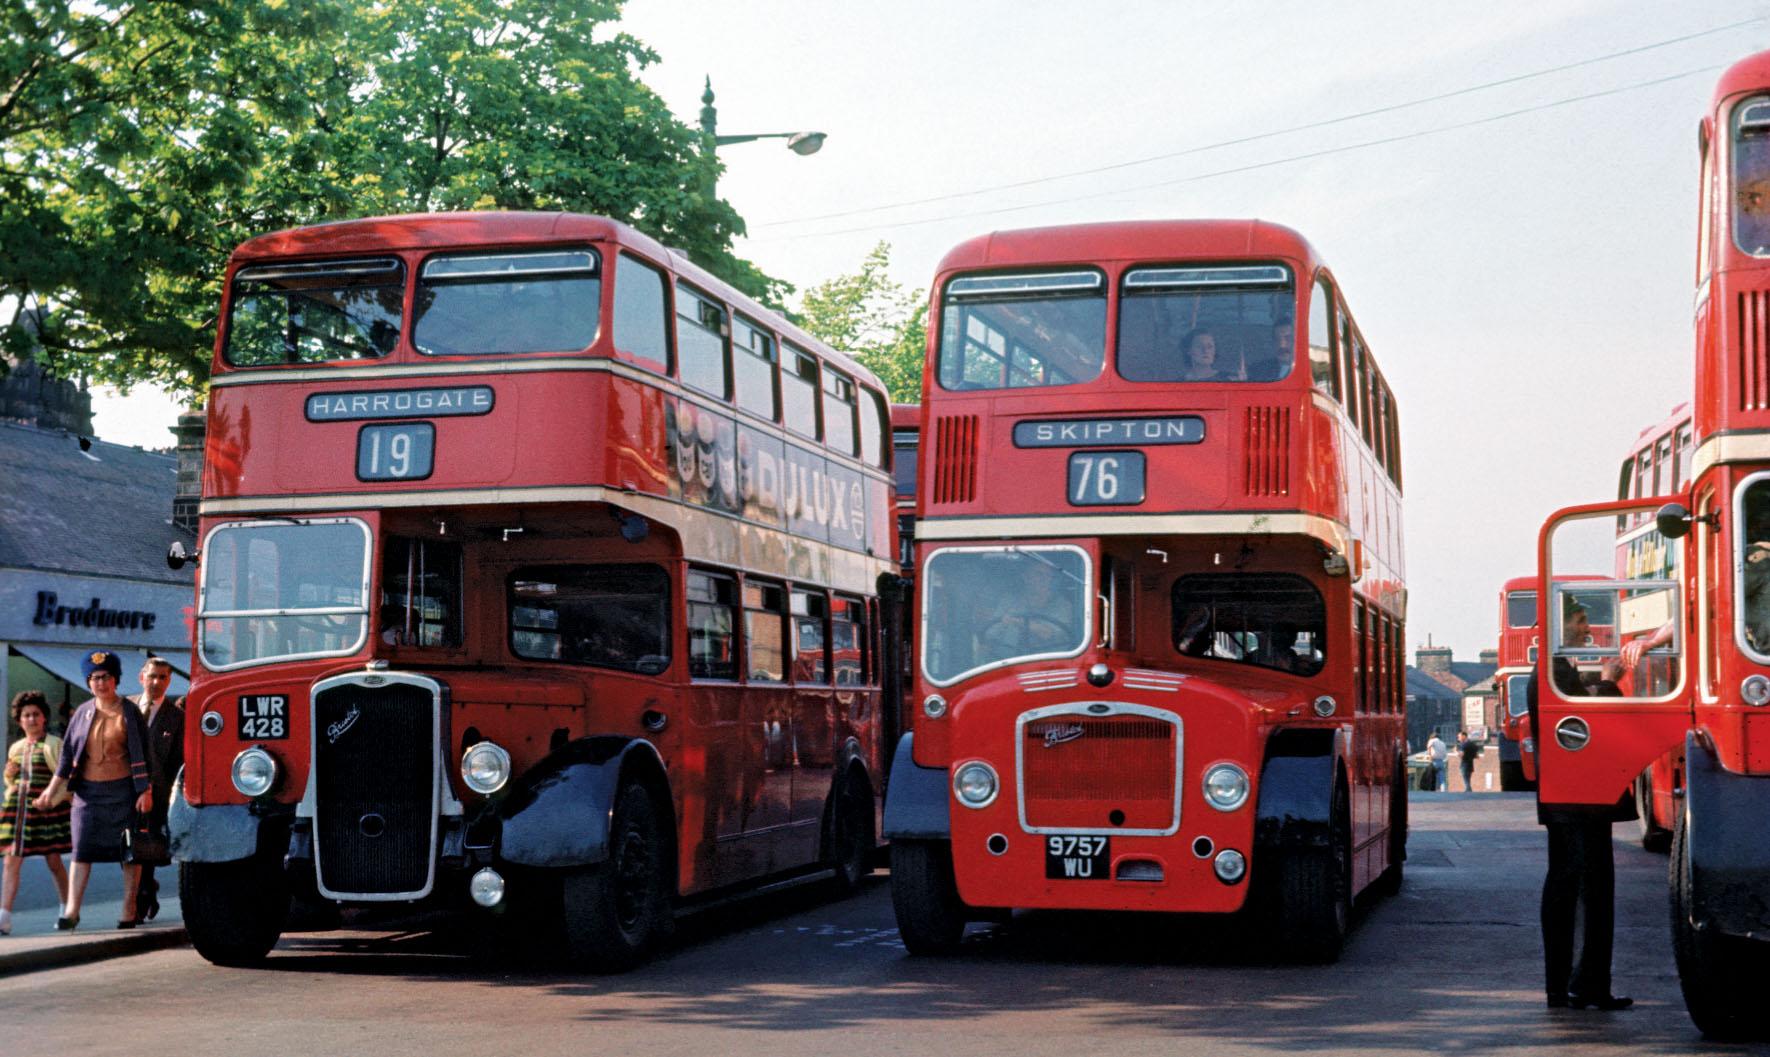 Harrogate Bus station